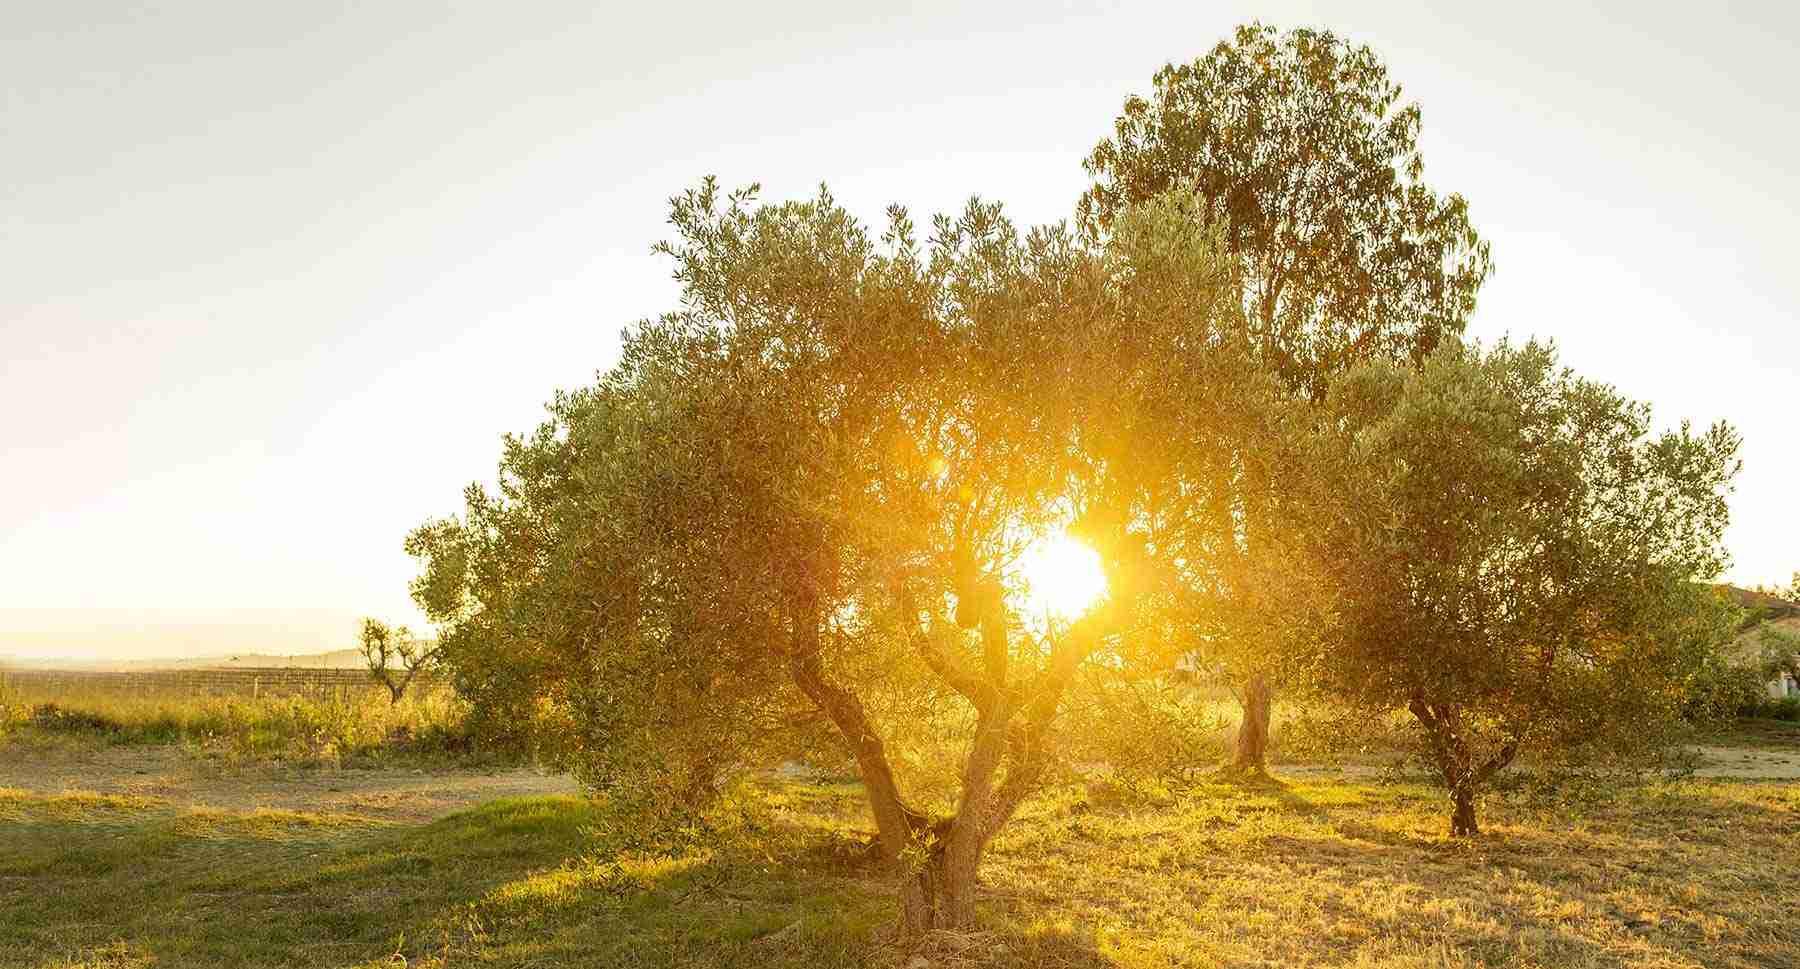 Olea Prilis extra virgin olive oil is good for our health and the planet.Olea Prilis